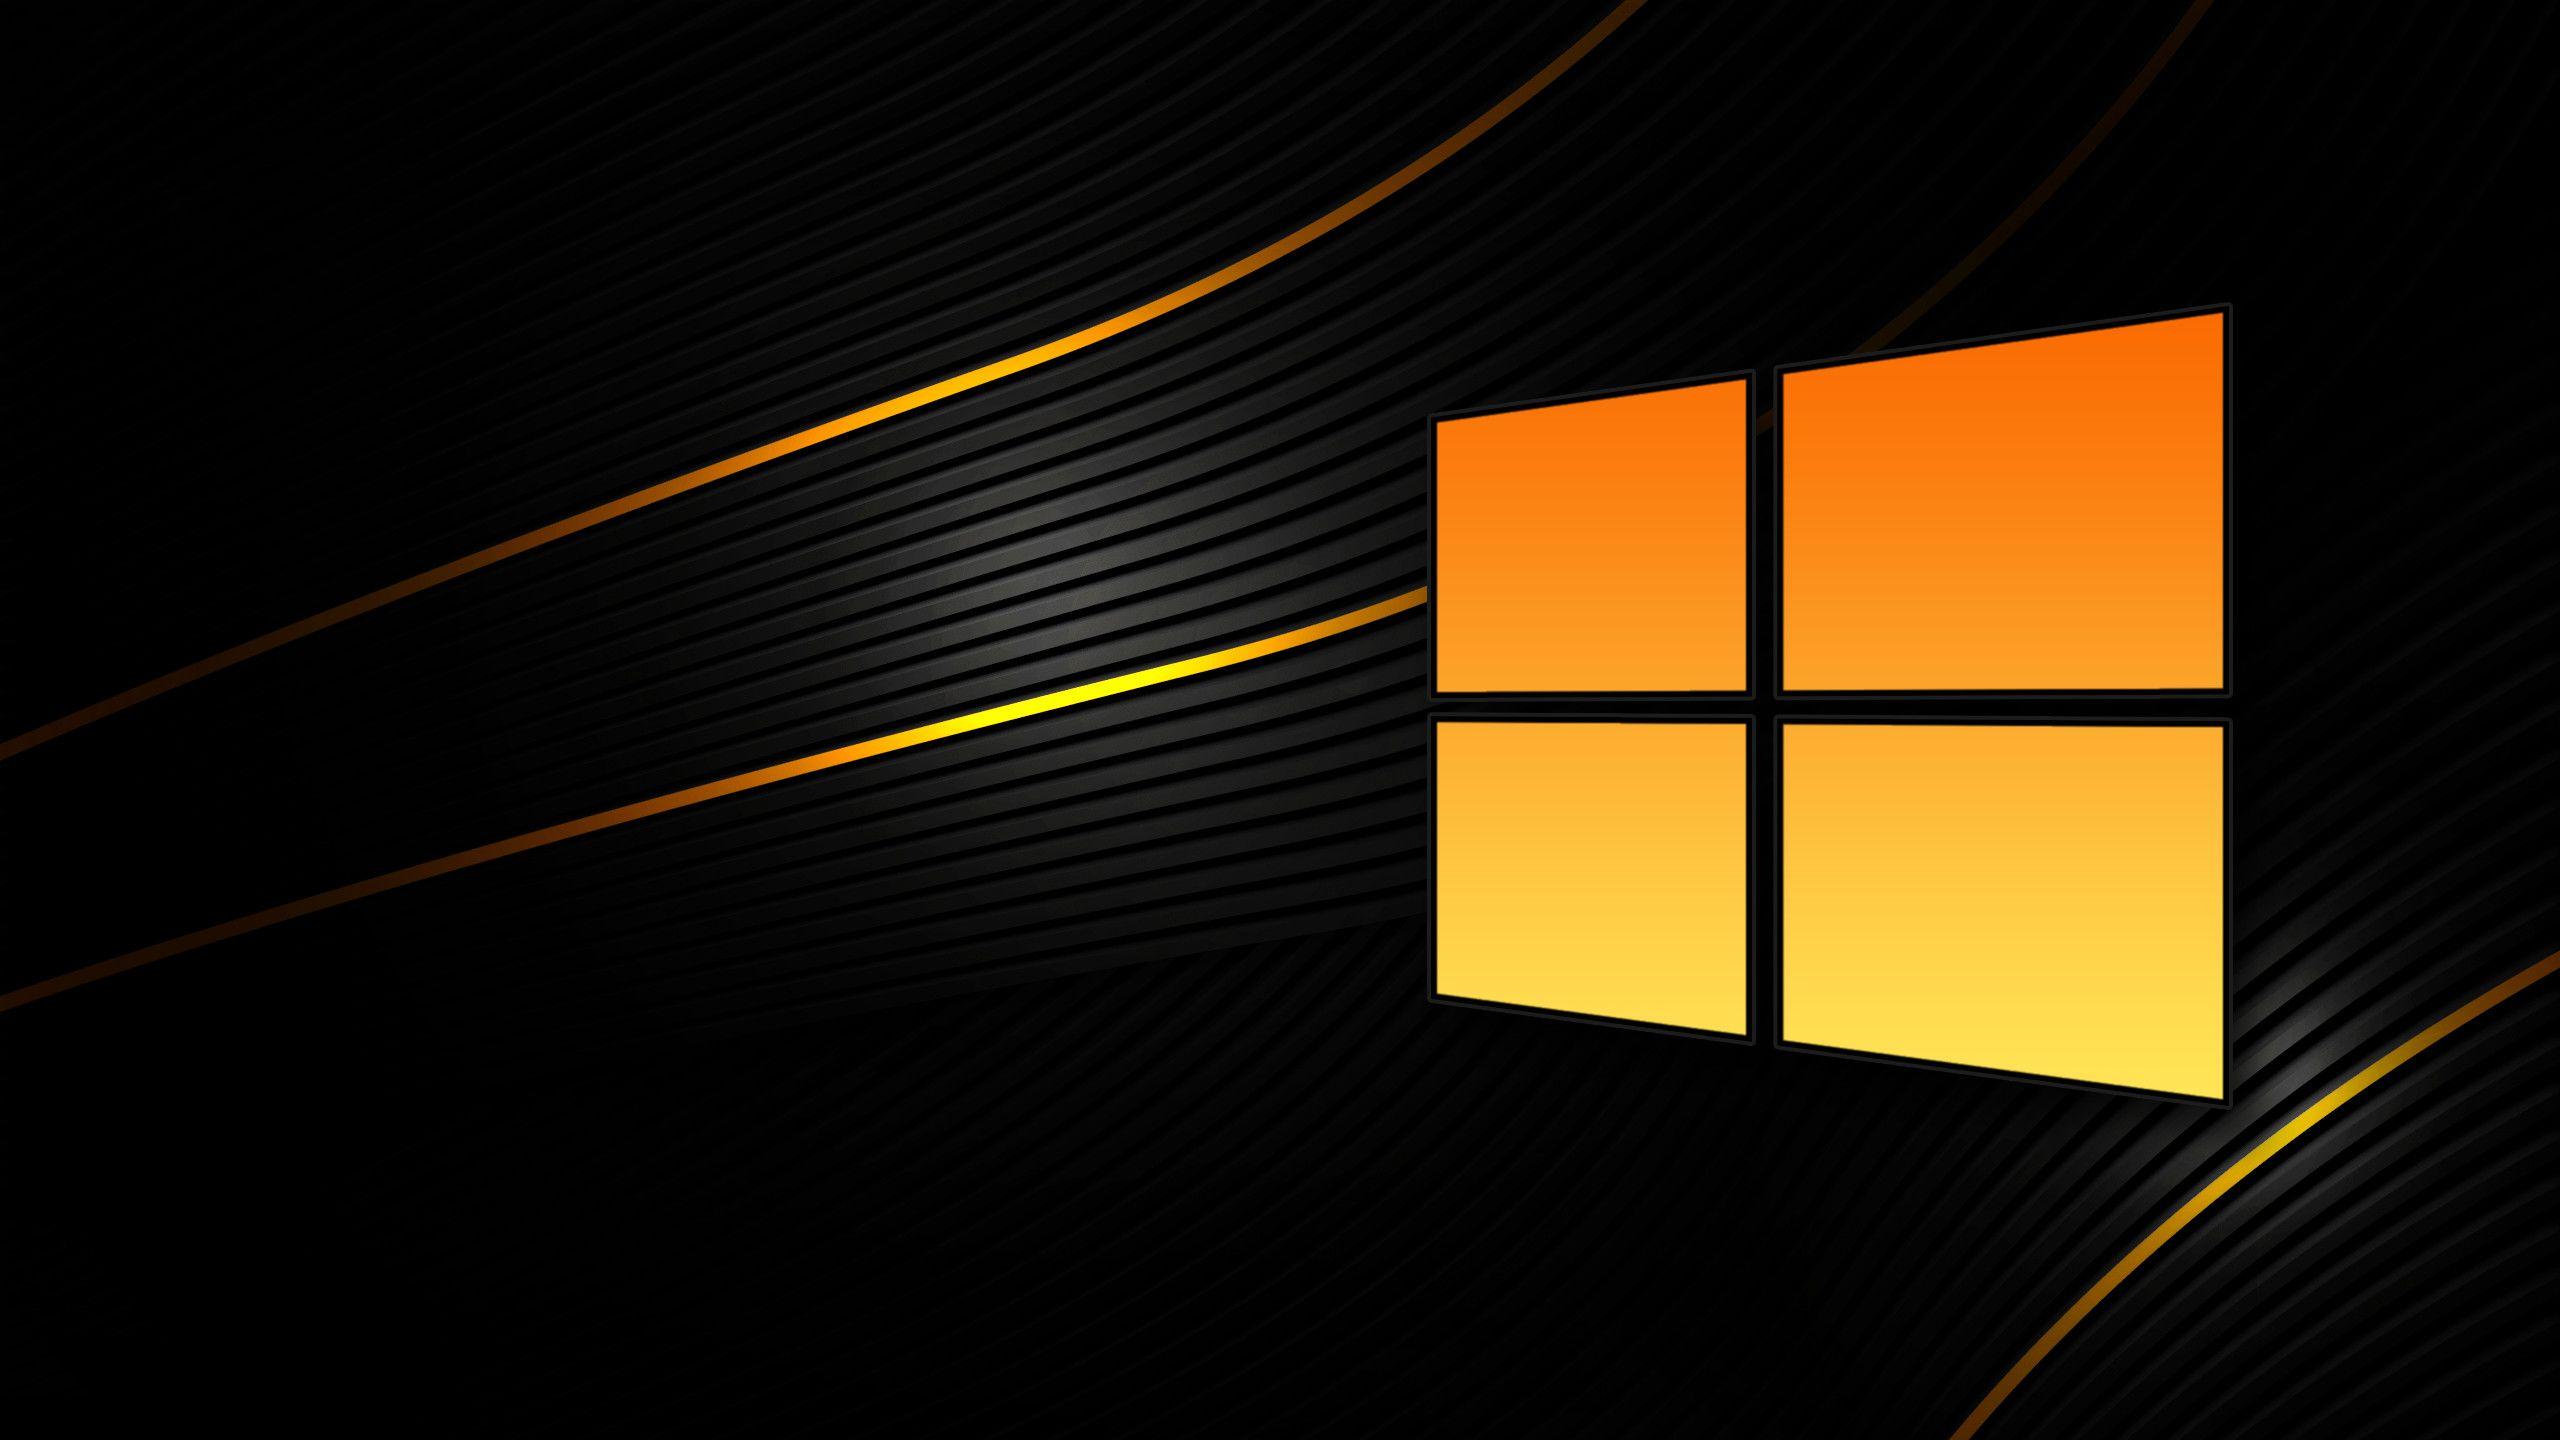 2560x1440 Name Lock Wallpaper Png Views 141675 Size Windows Wallpaper Wallpaper Windows 10 8k Wallpaper